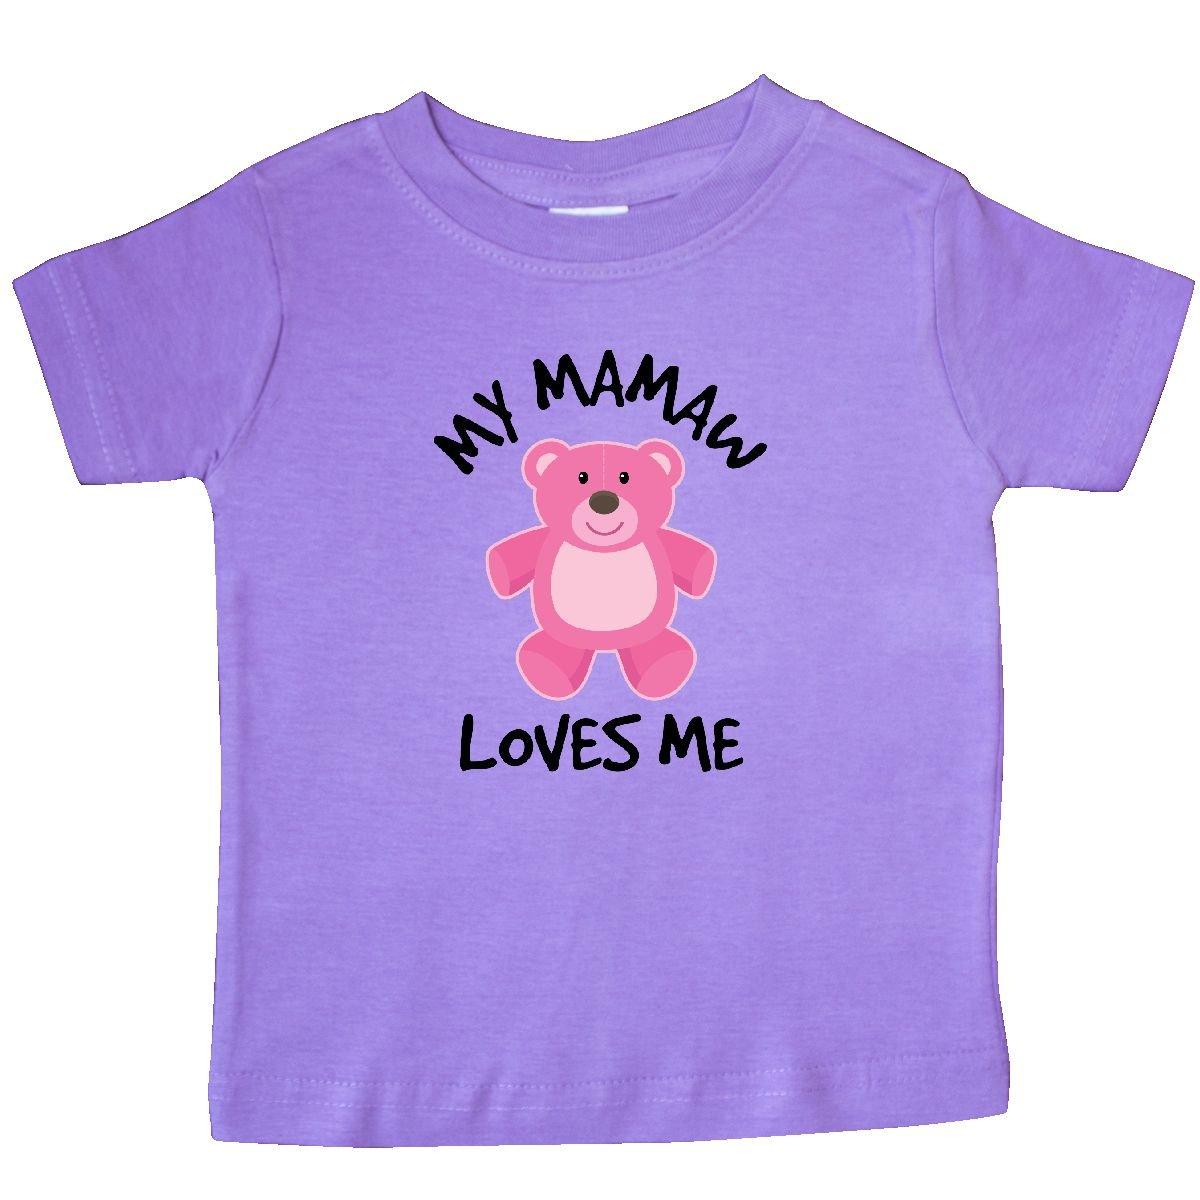 Inktastic Mamaw Loves Me Grandchild Gift Toddler Dress From Granddaughter Girls